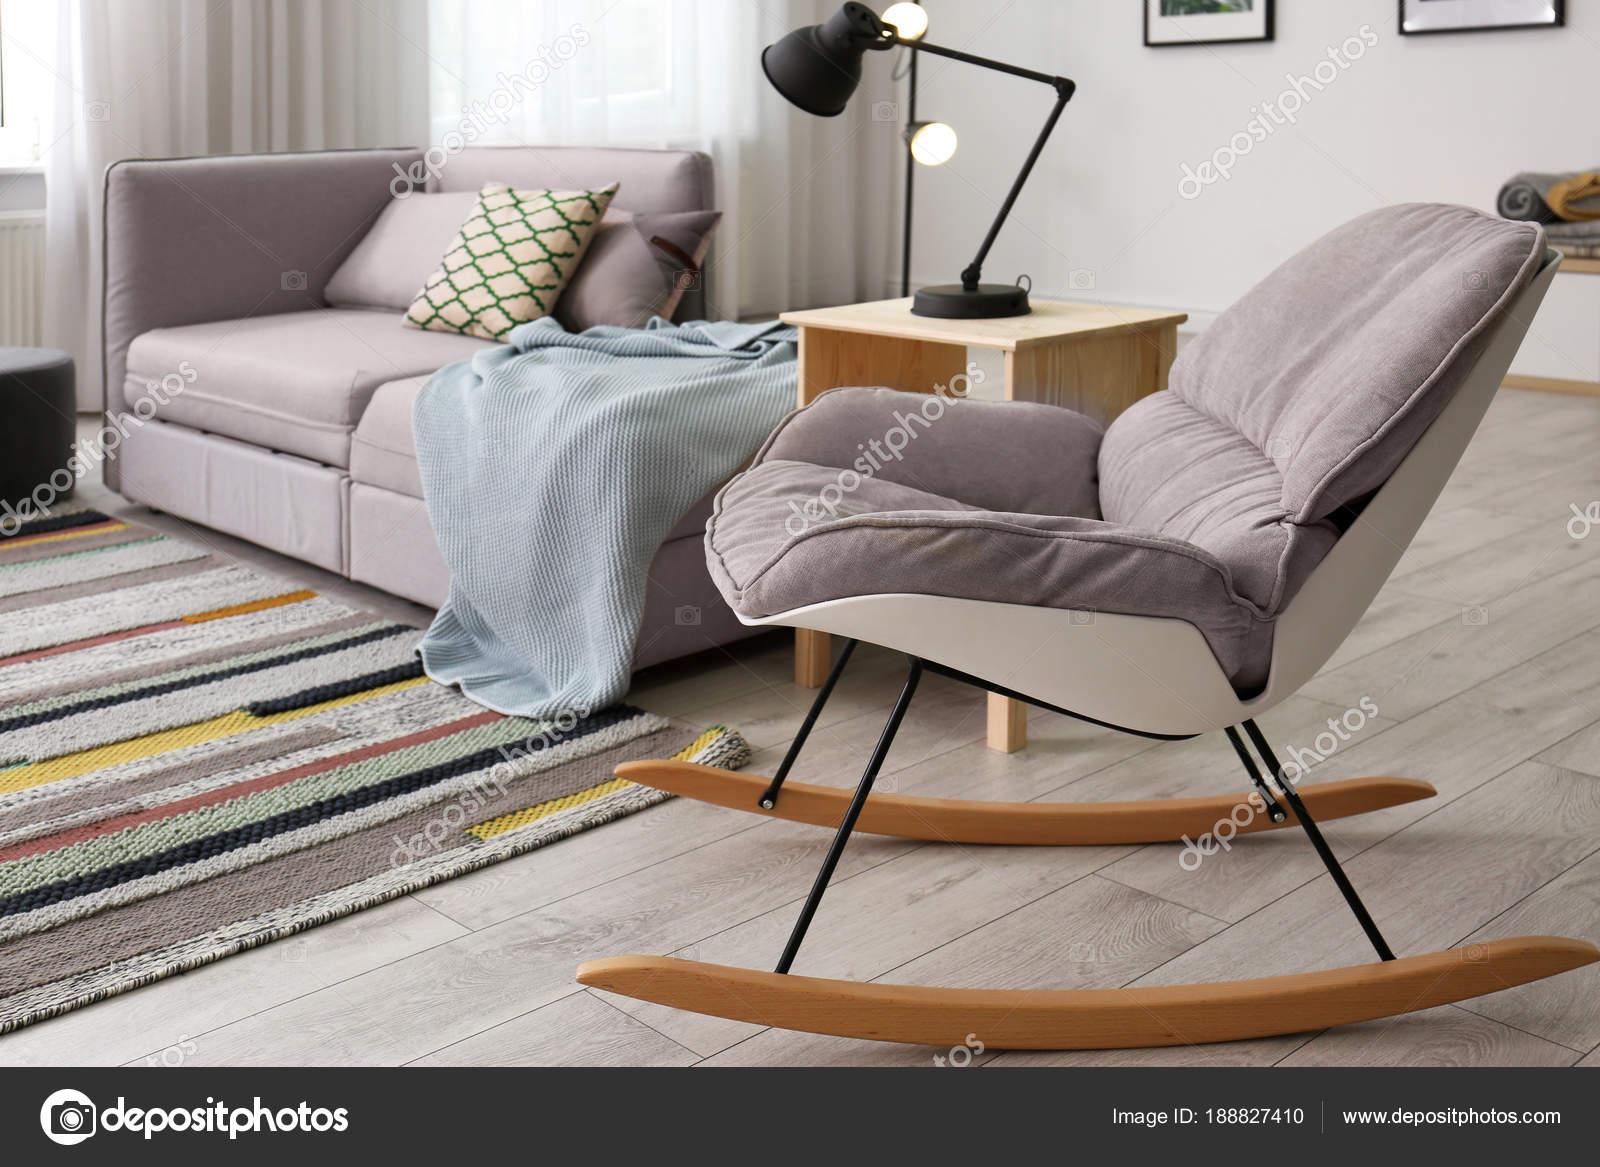 Stylish Living Room Interior With Rocking Chair And Comfortable Sofa Stock Photo C Liudmilachernetska Gmail Com 188827410